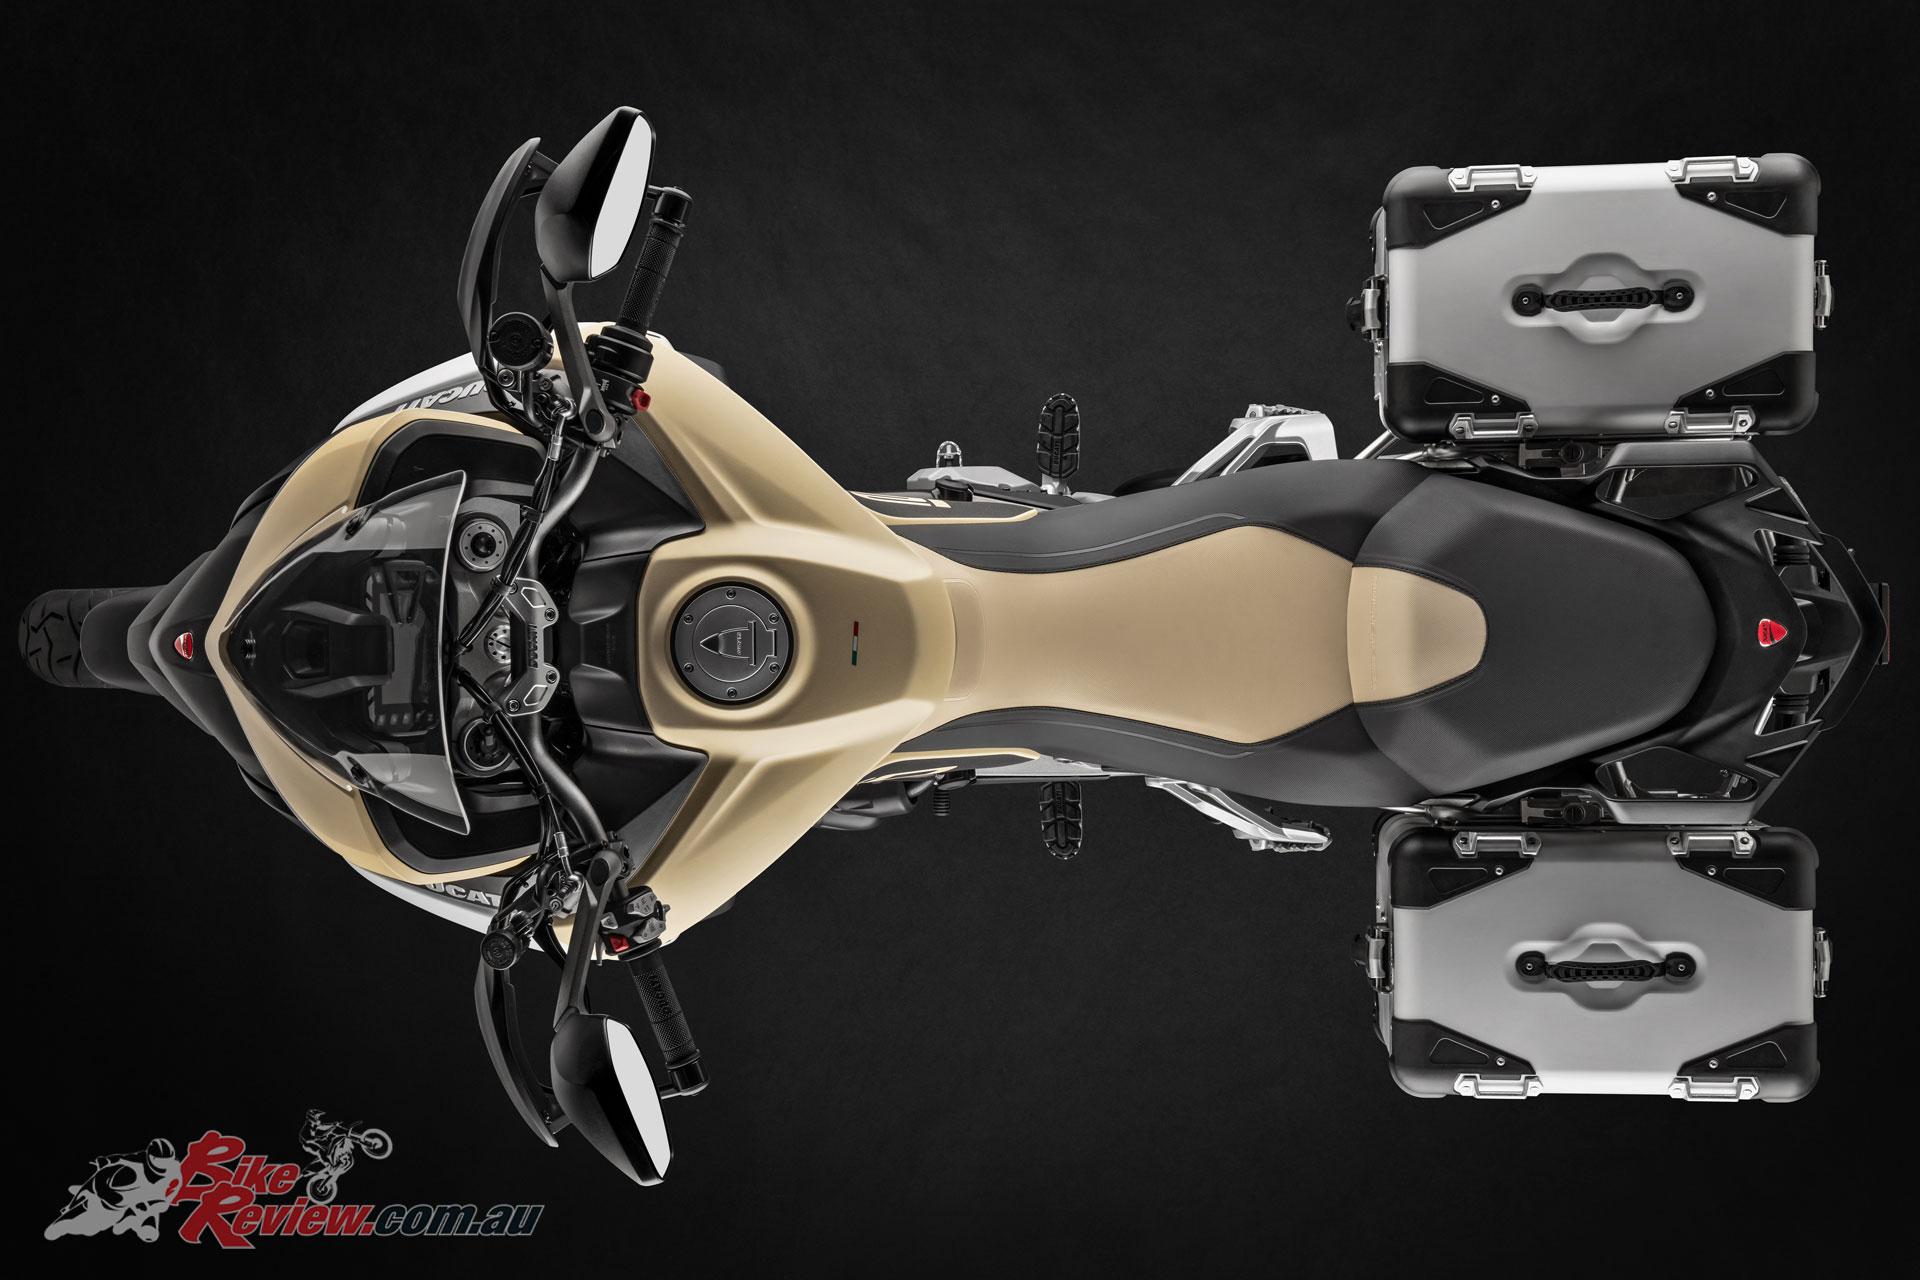 2019 Ducati Multistrada 1260 Enduro